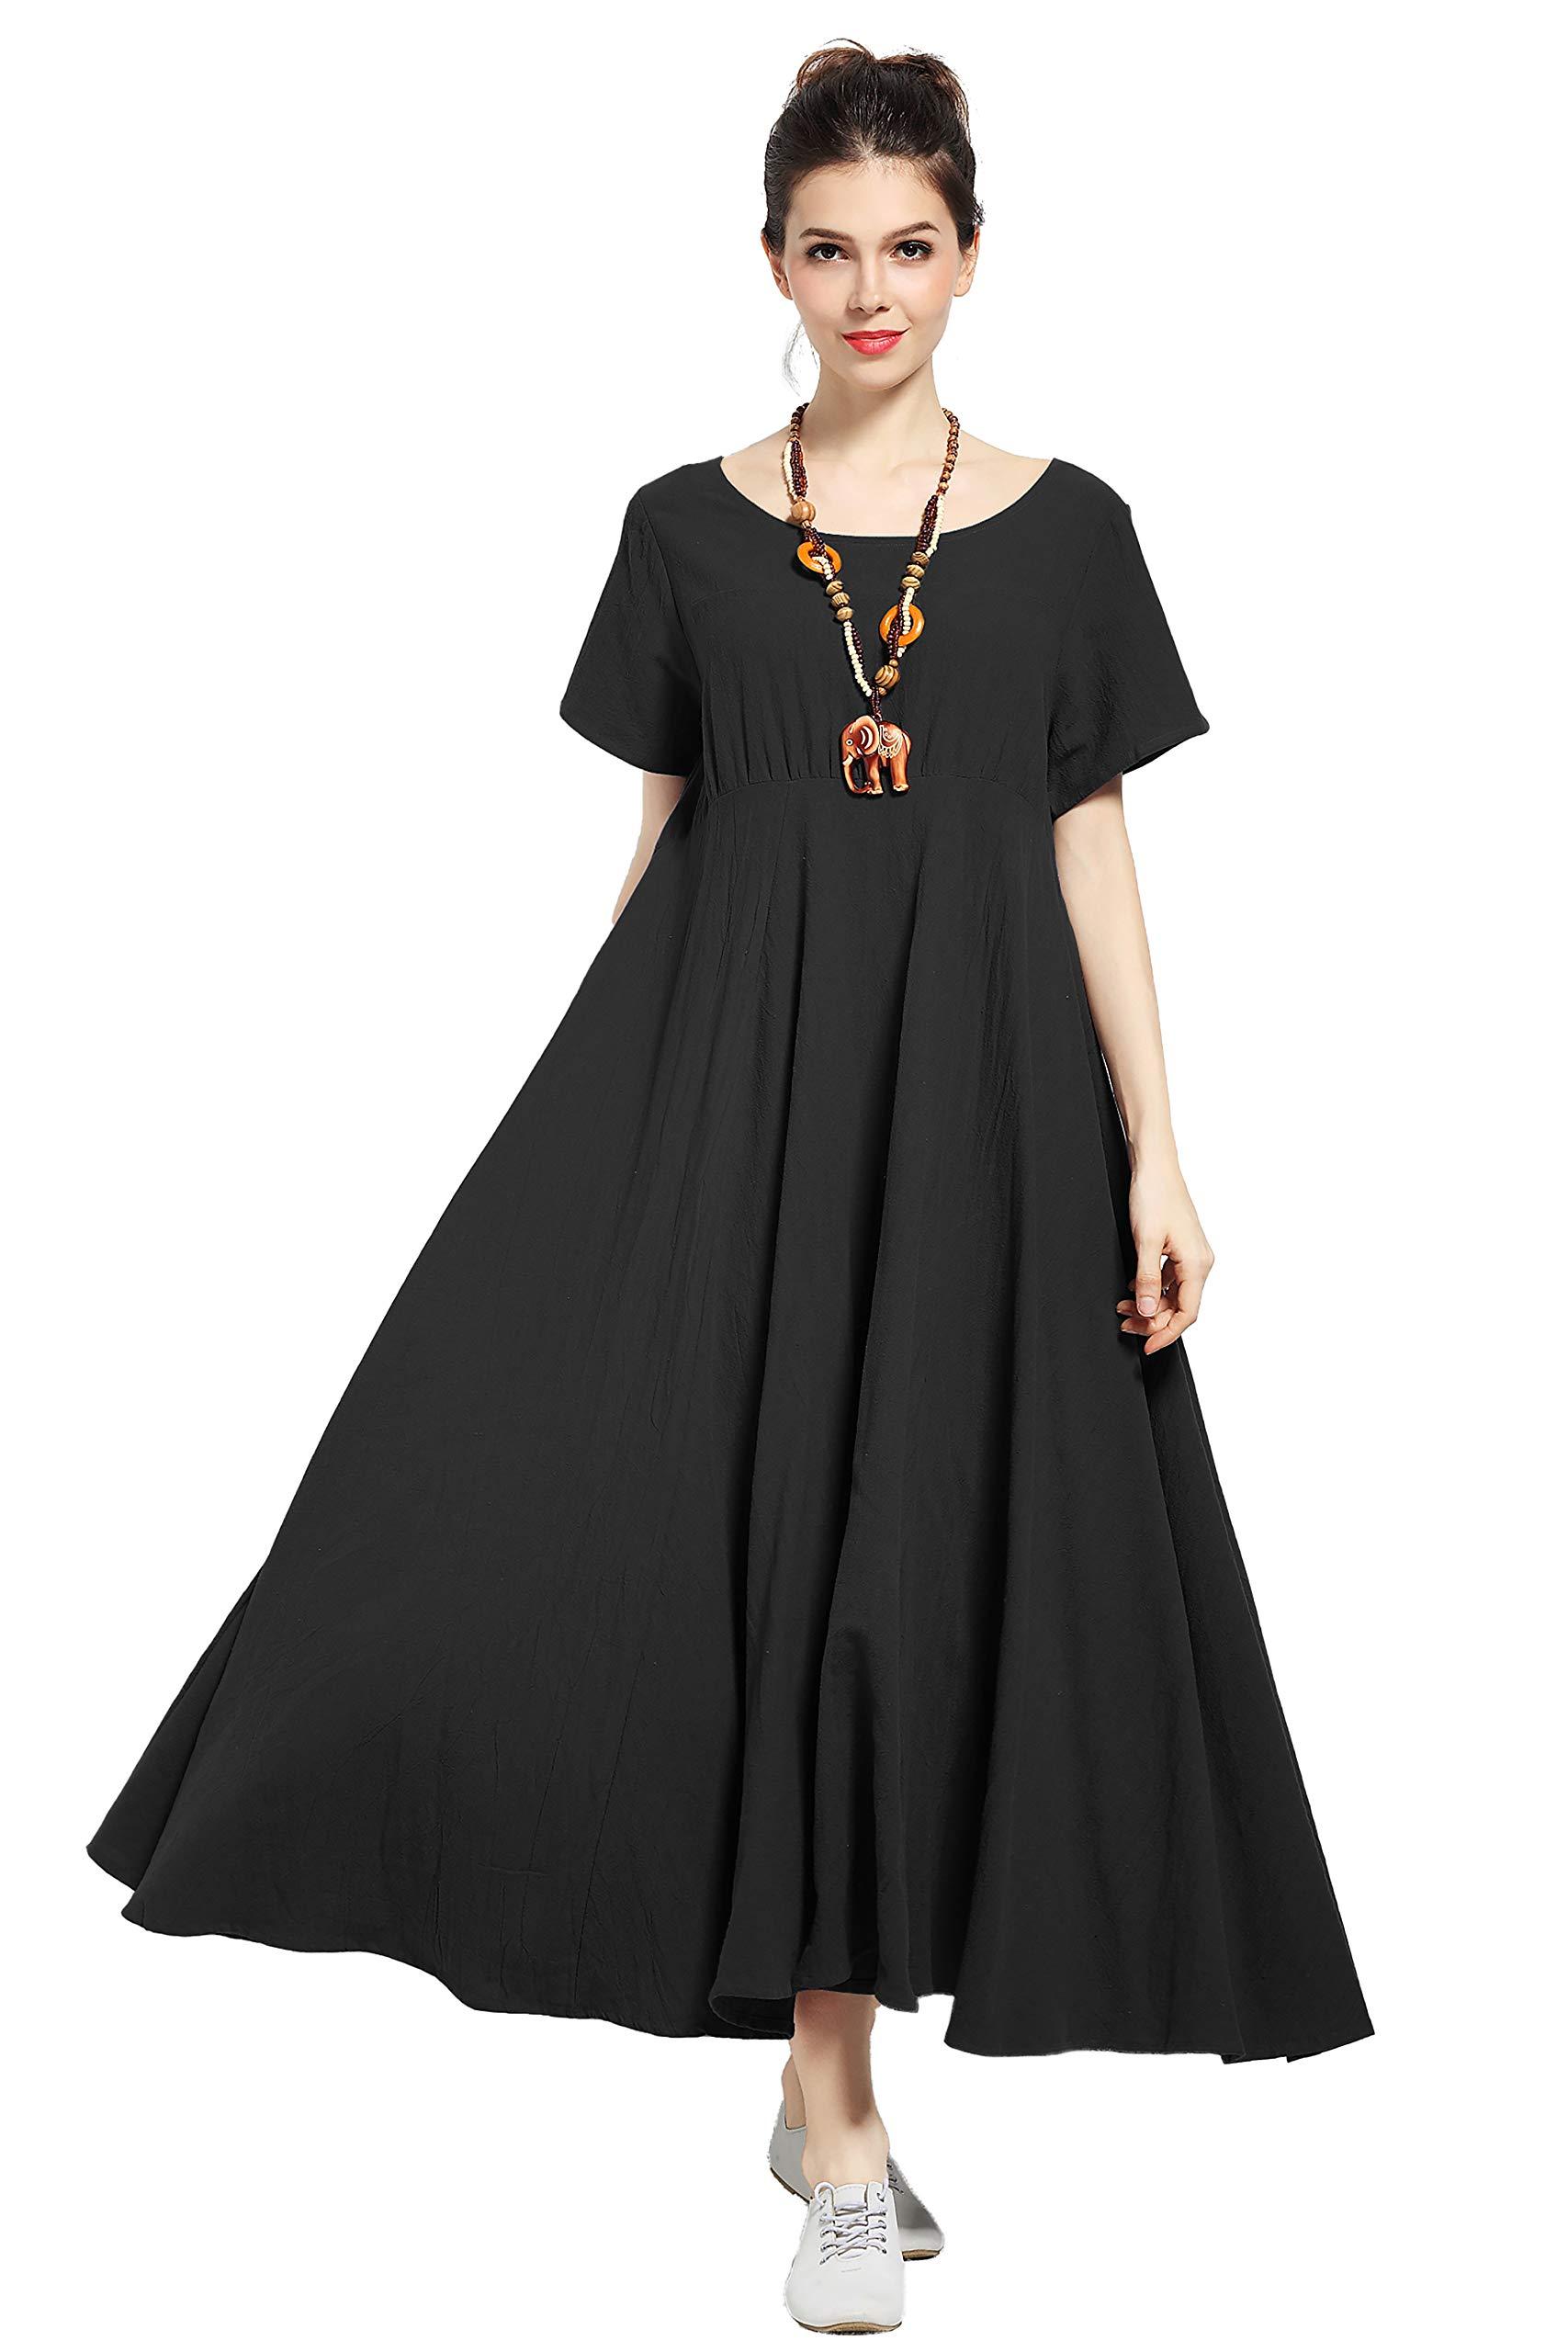 Anysize New Version Soft Linen Cotton Spring Summer Dress Plus Size Dress Y6 Black by Anysize